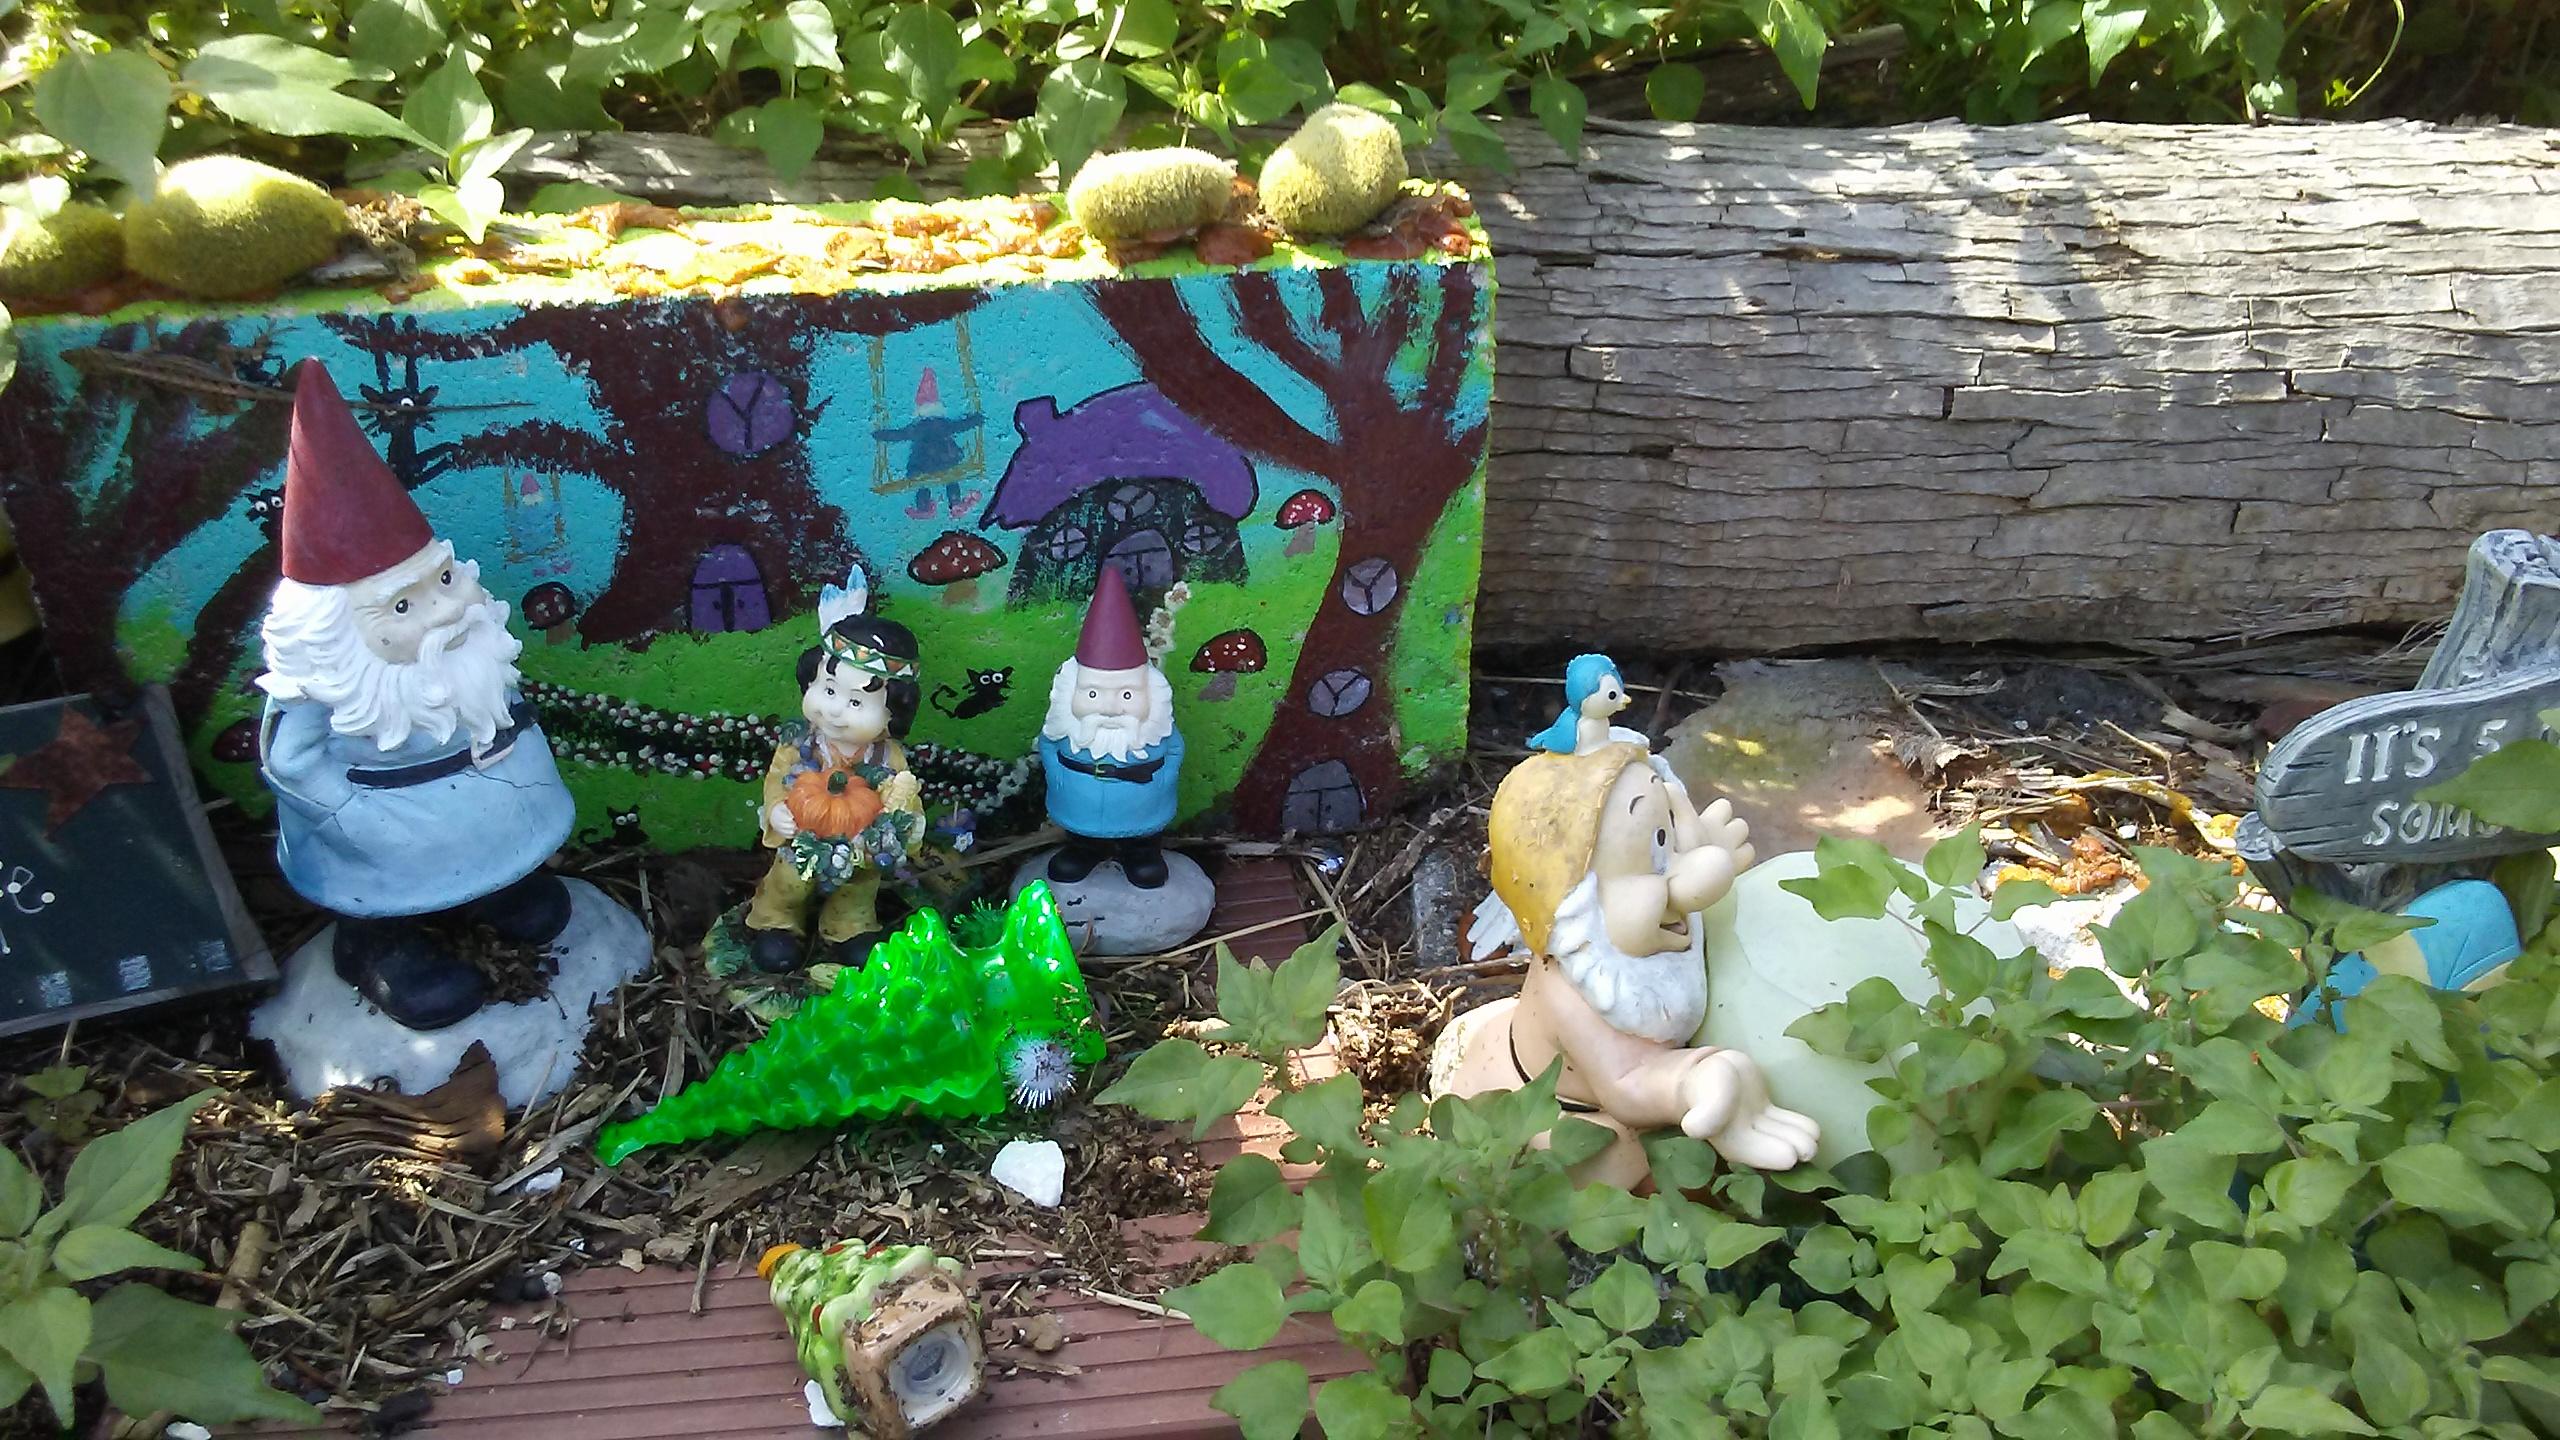 20190202_133300-jpg.48853_Gnome Village......!_Travel Stories_Squat the Planet_12:14 PM